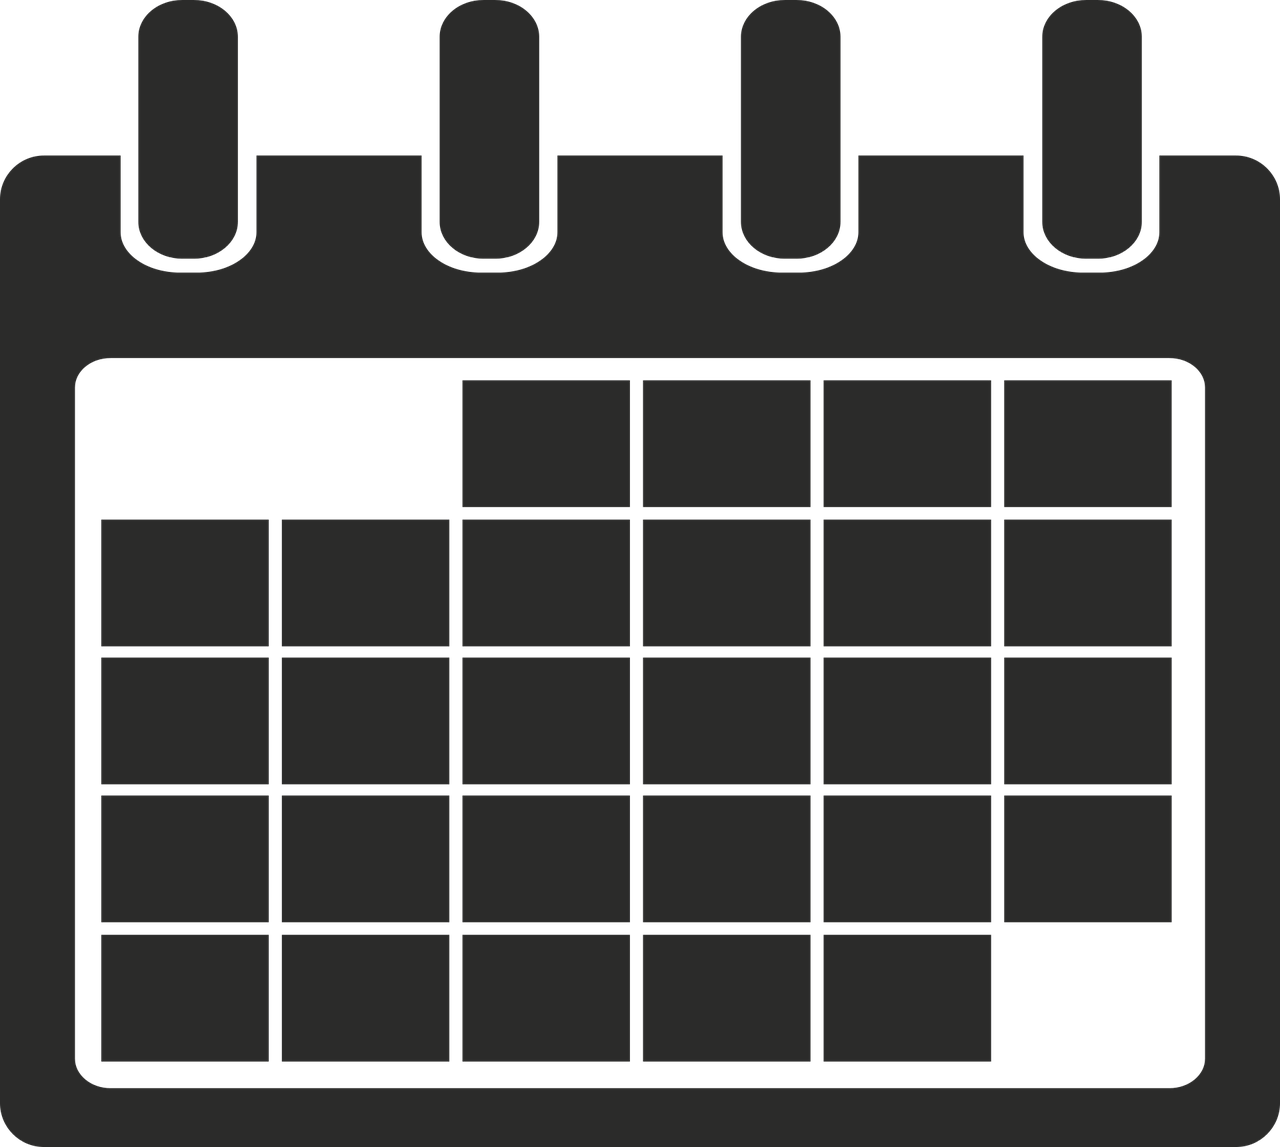 calendar-1559935_1280